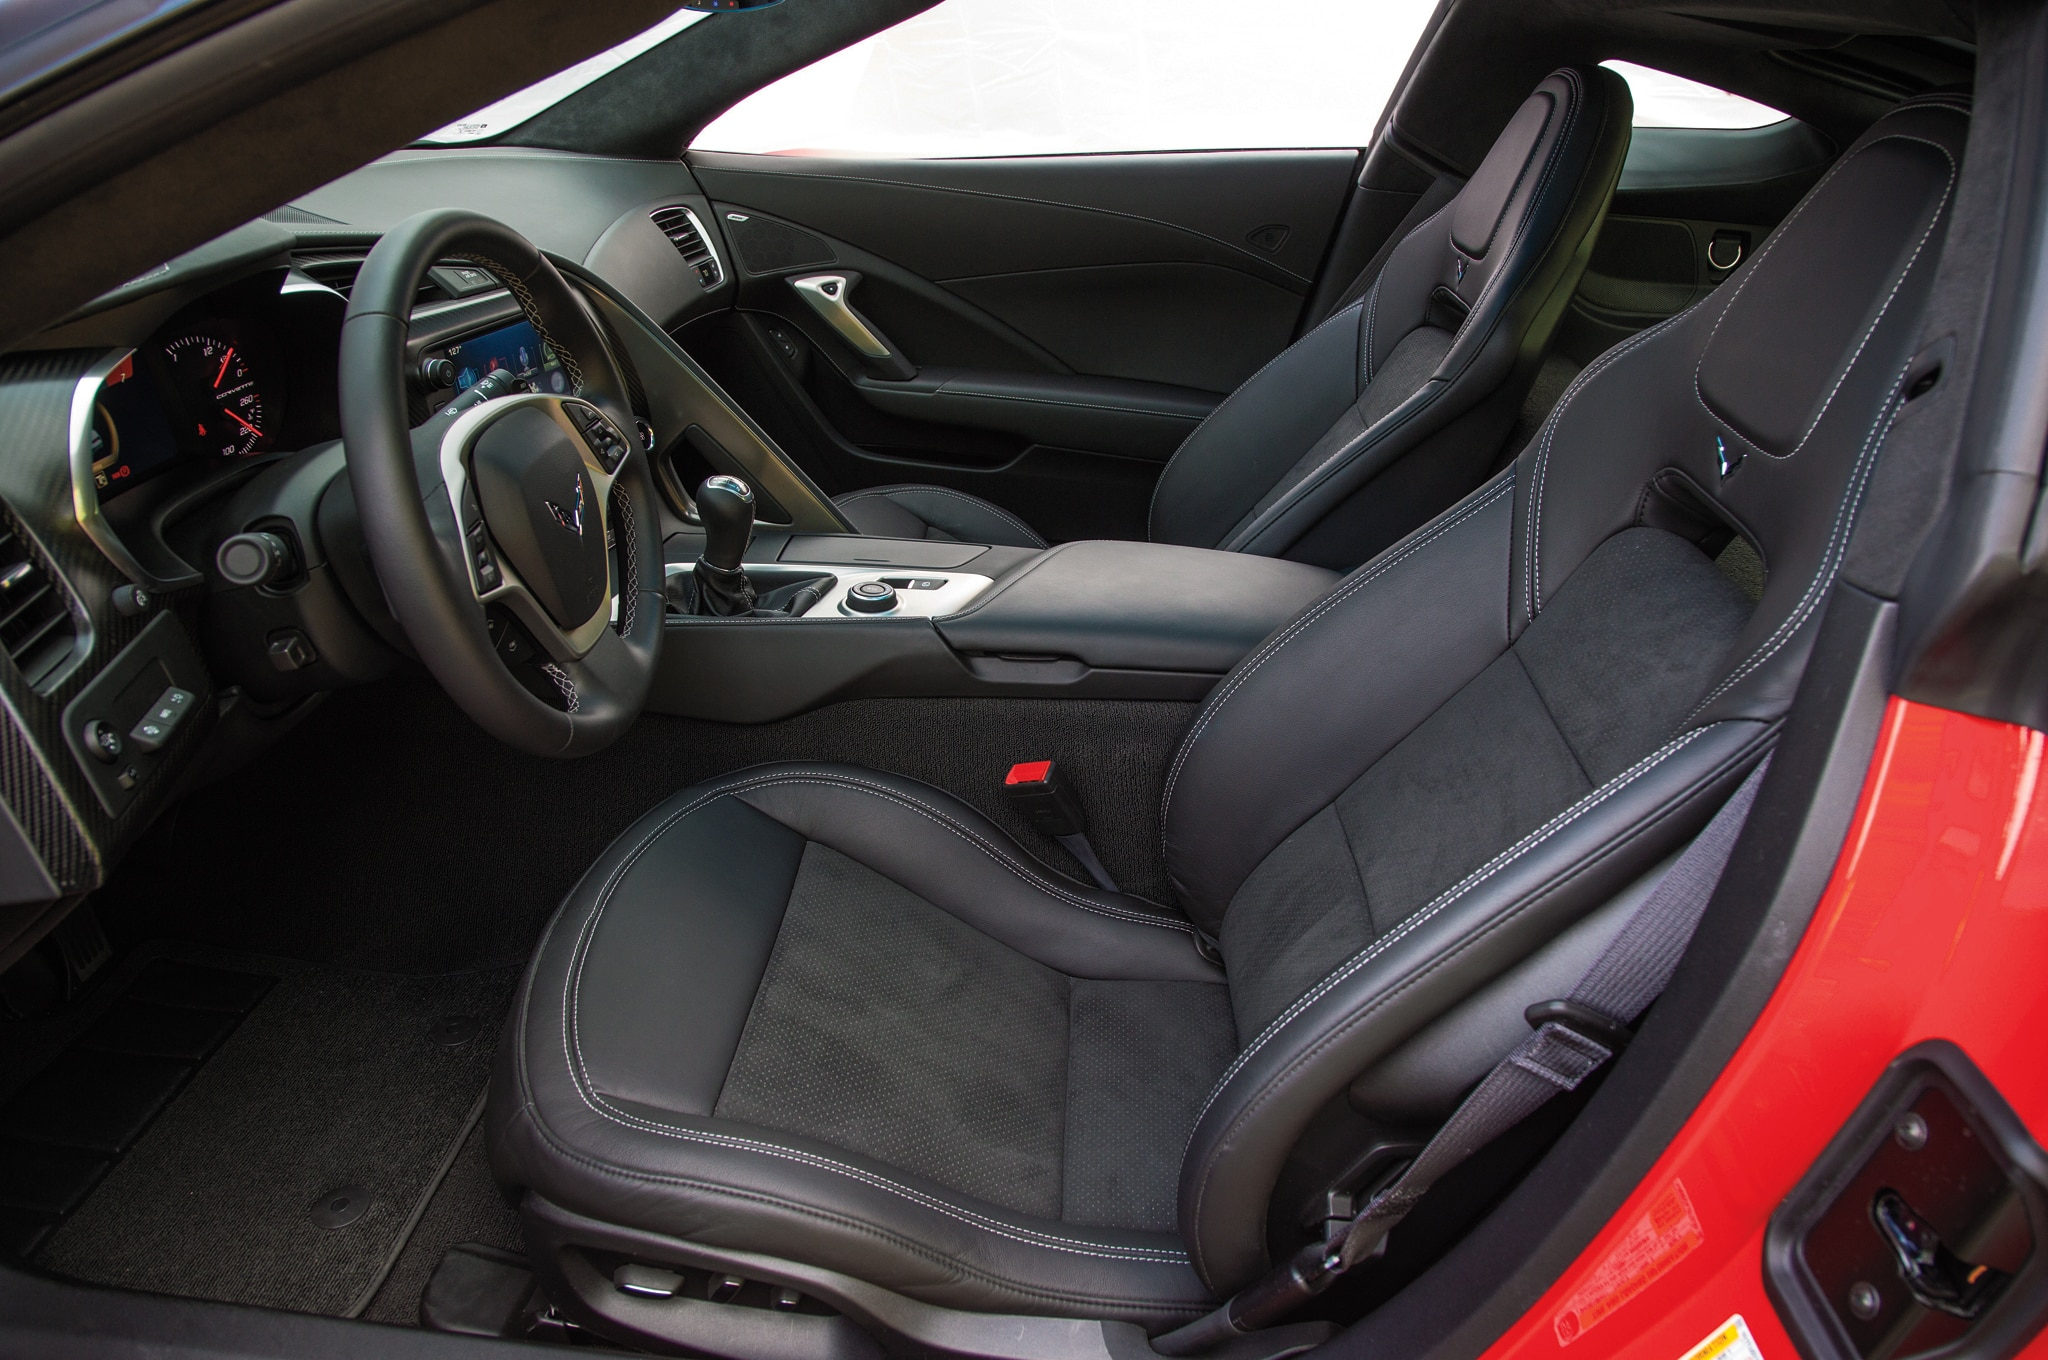 2014 chevrolet corvette stingray z51 front interior seats - Corvette 2013 Stingray Interior